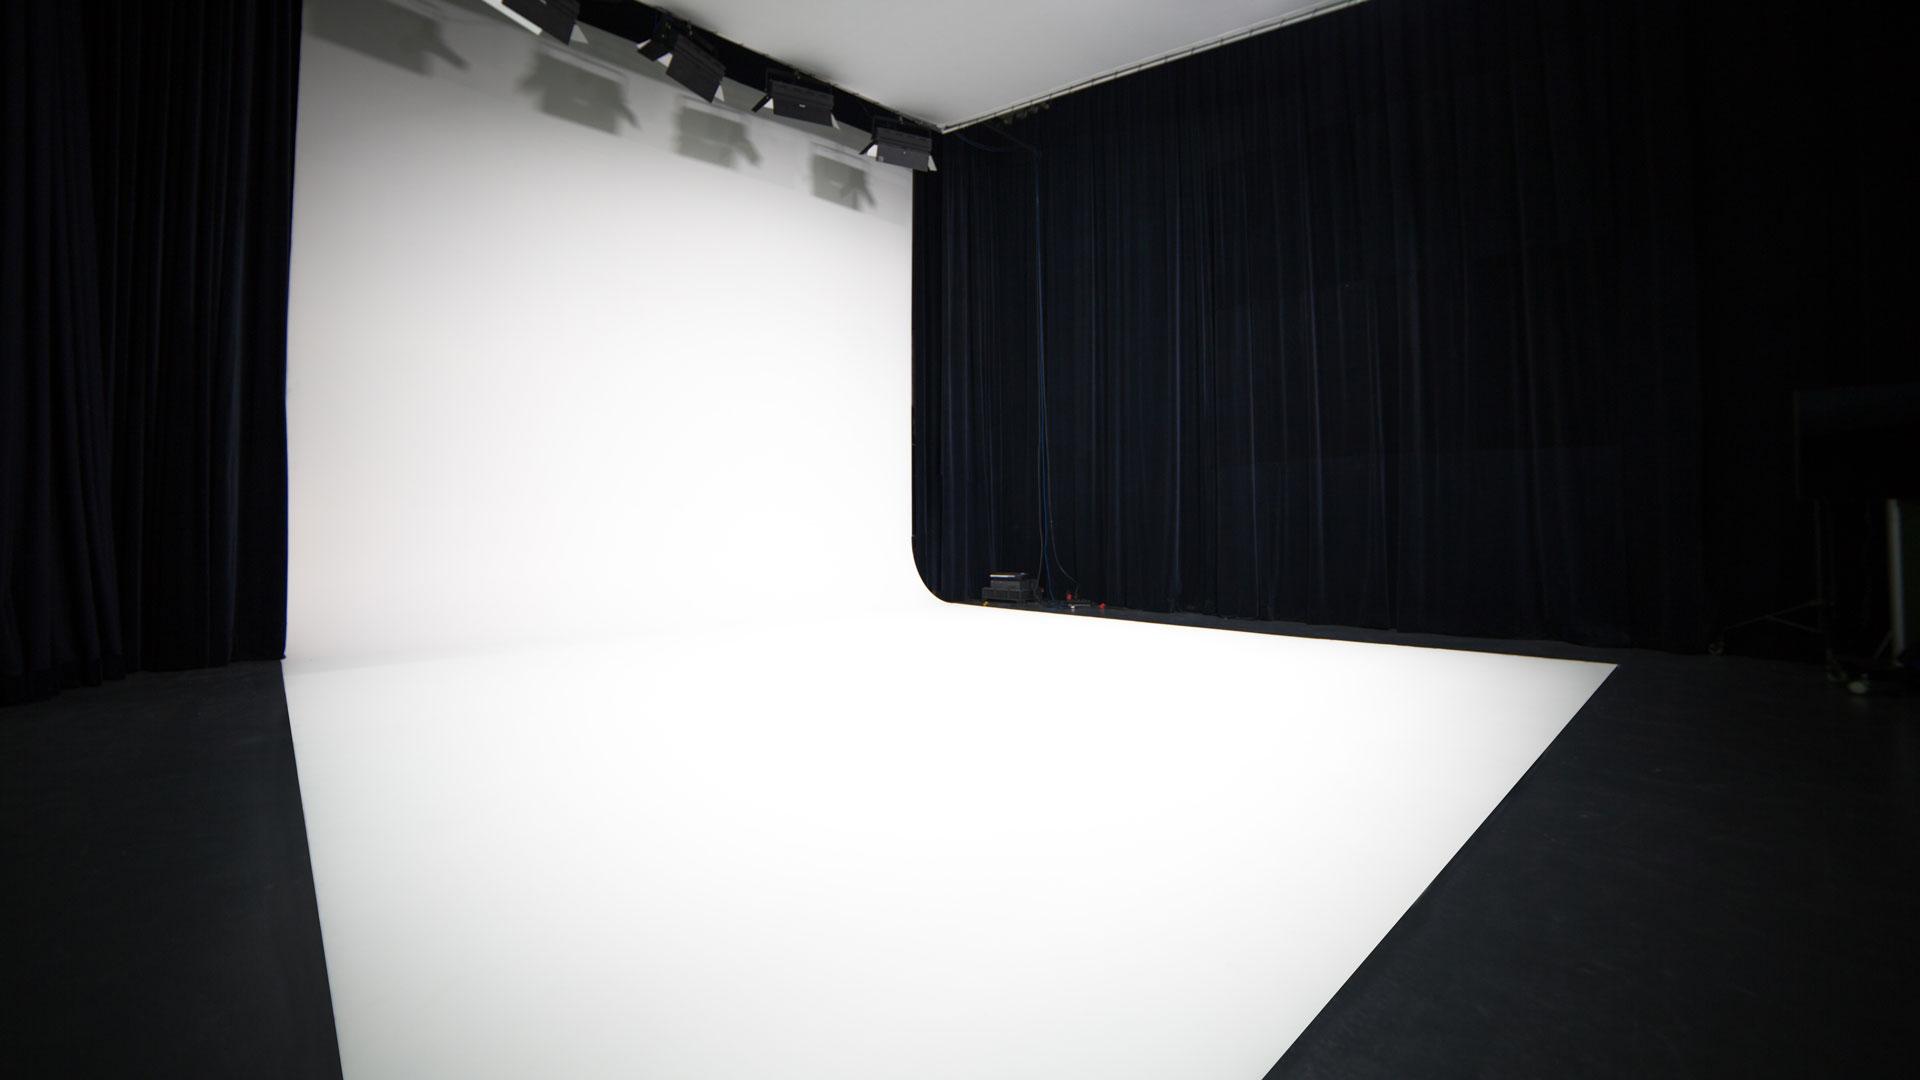 fotostudio-web